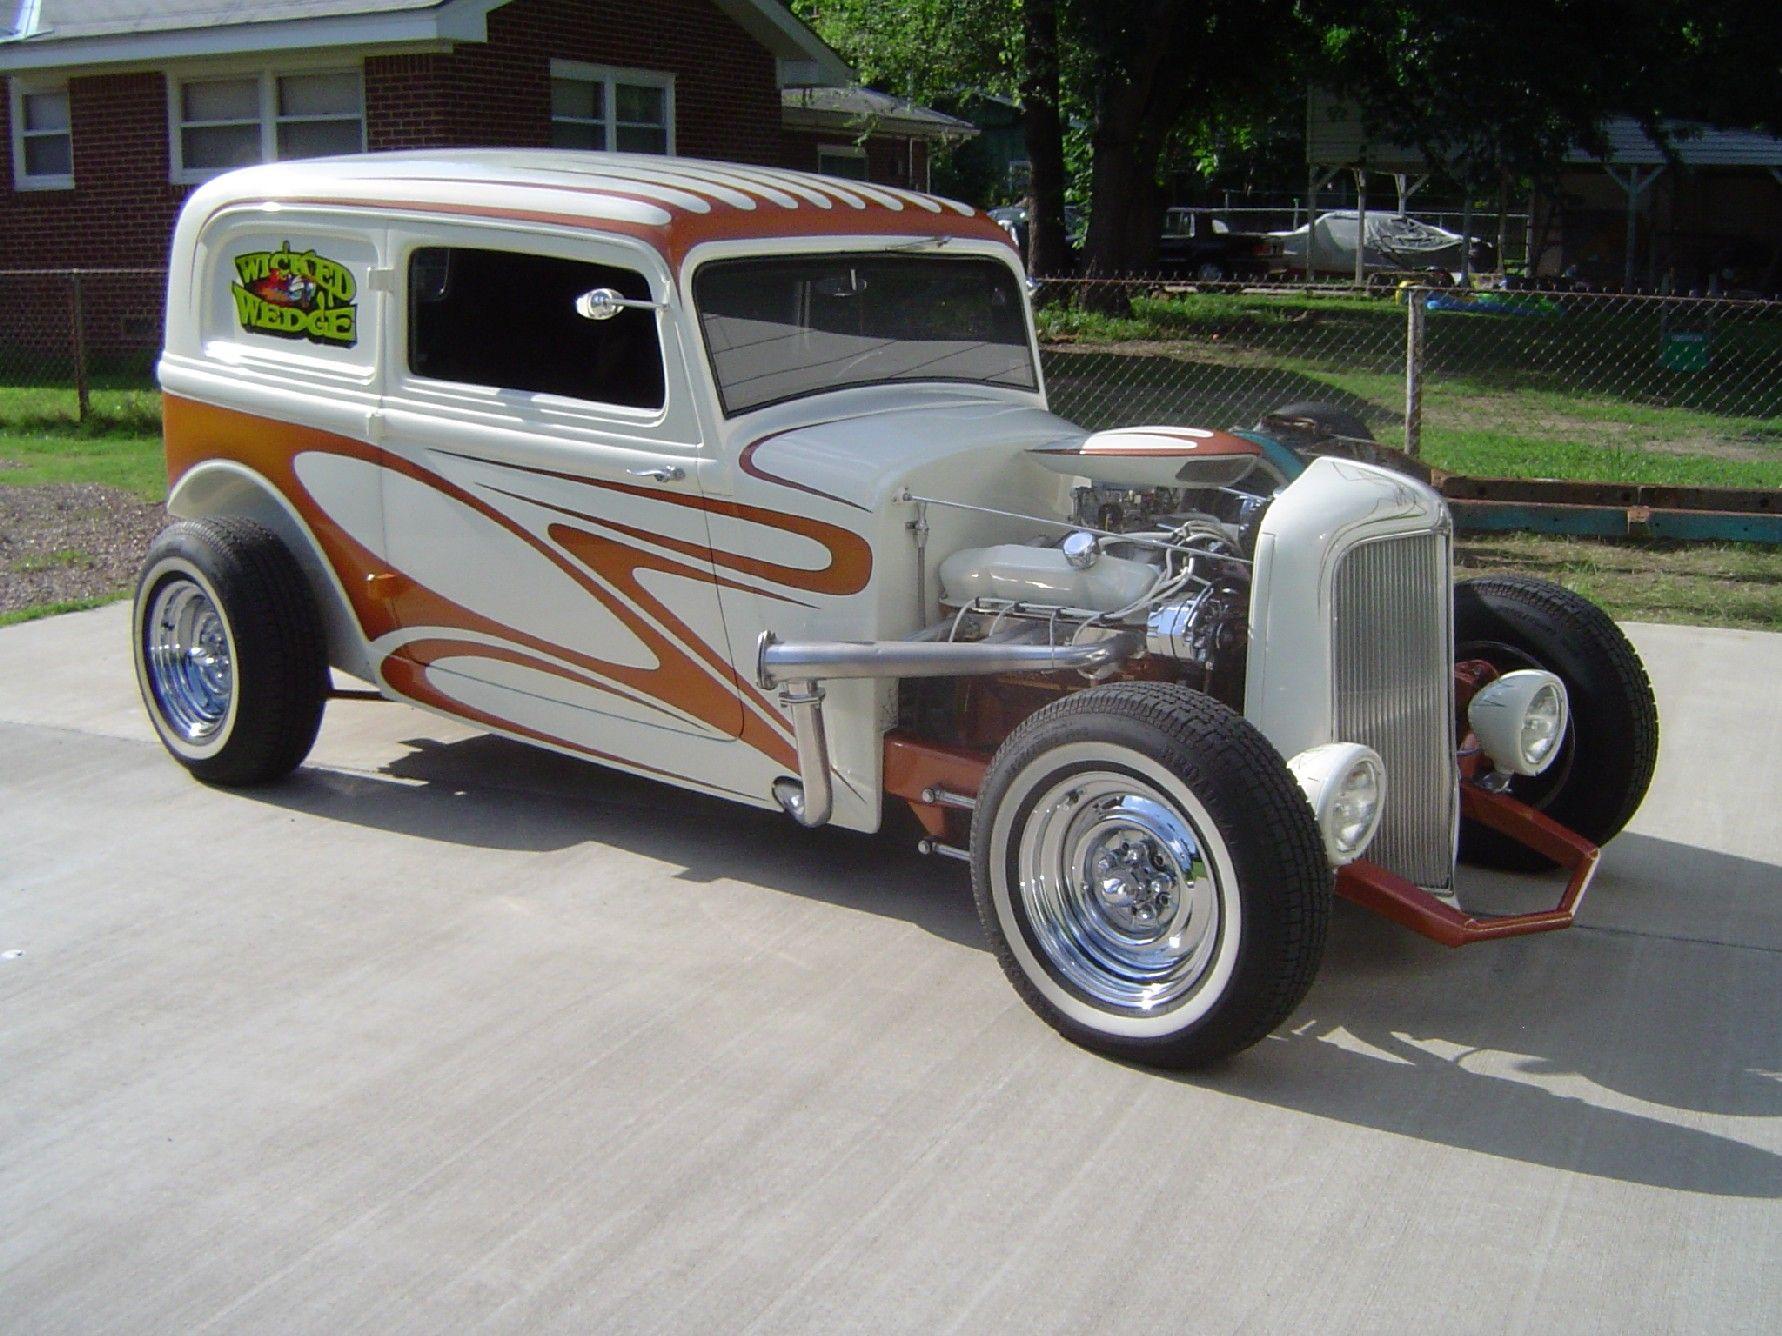 Motor\'n New   For sale 1934 Custom Plymouth Hi-Boy Sedan Street Rod ...